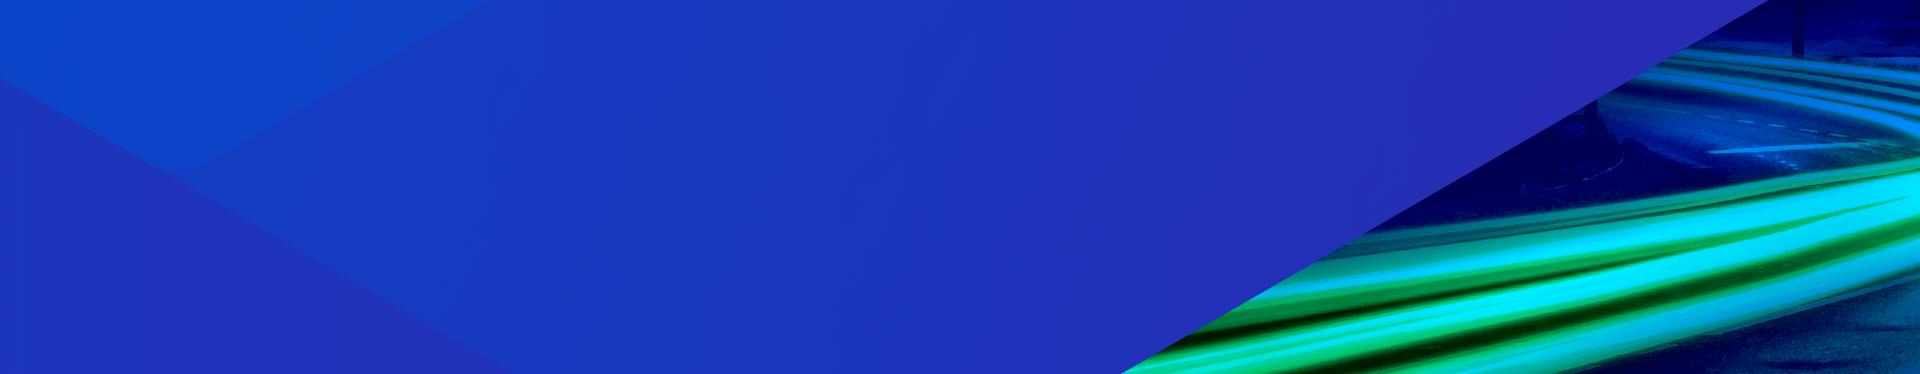 app-modernization-pug-webinars-banner